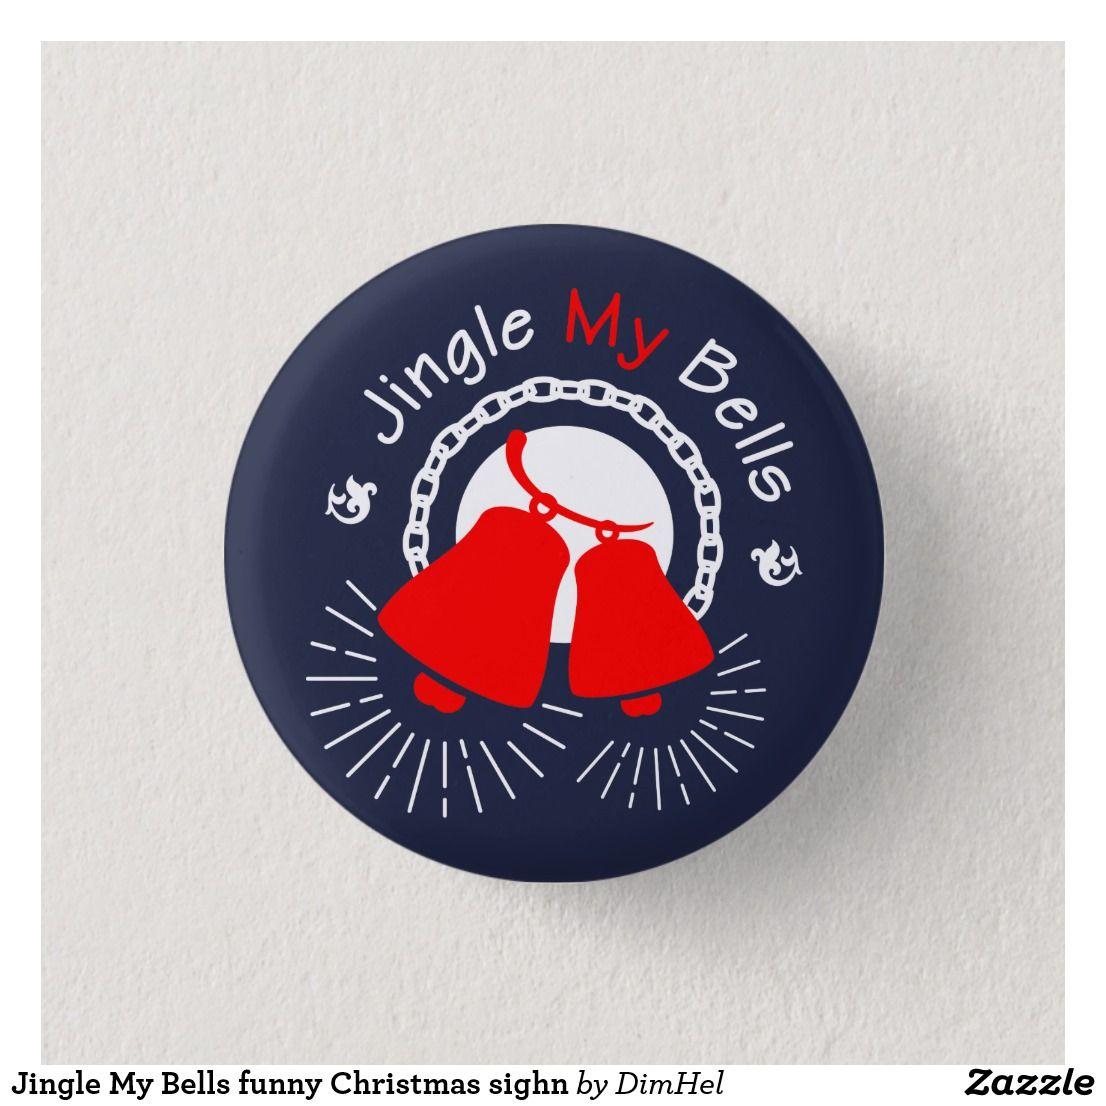 Jingle My Bells funny Christmas sighn Button